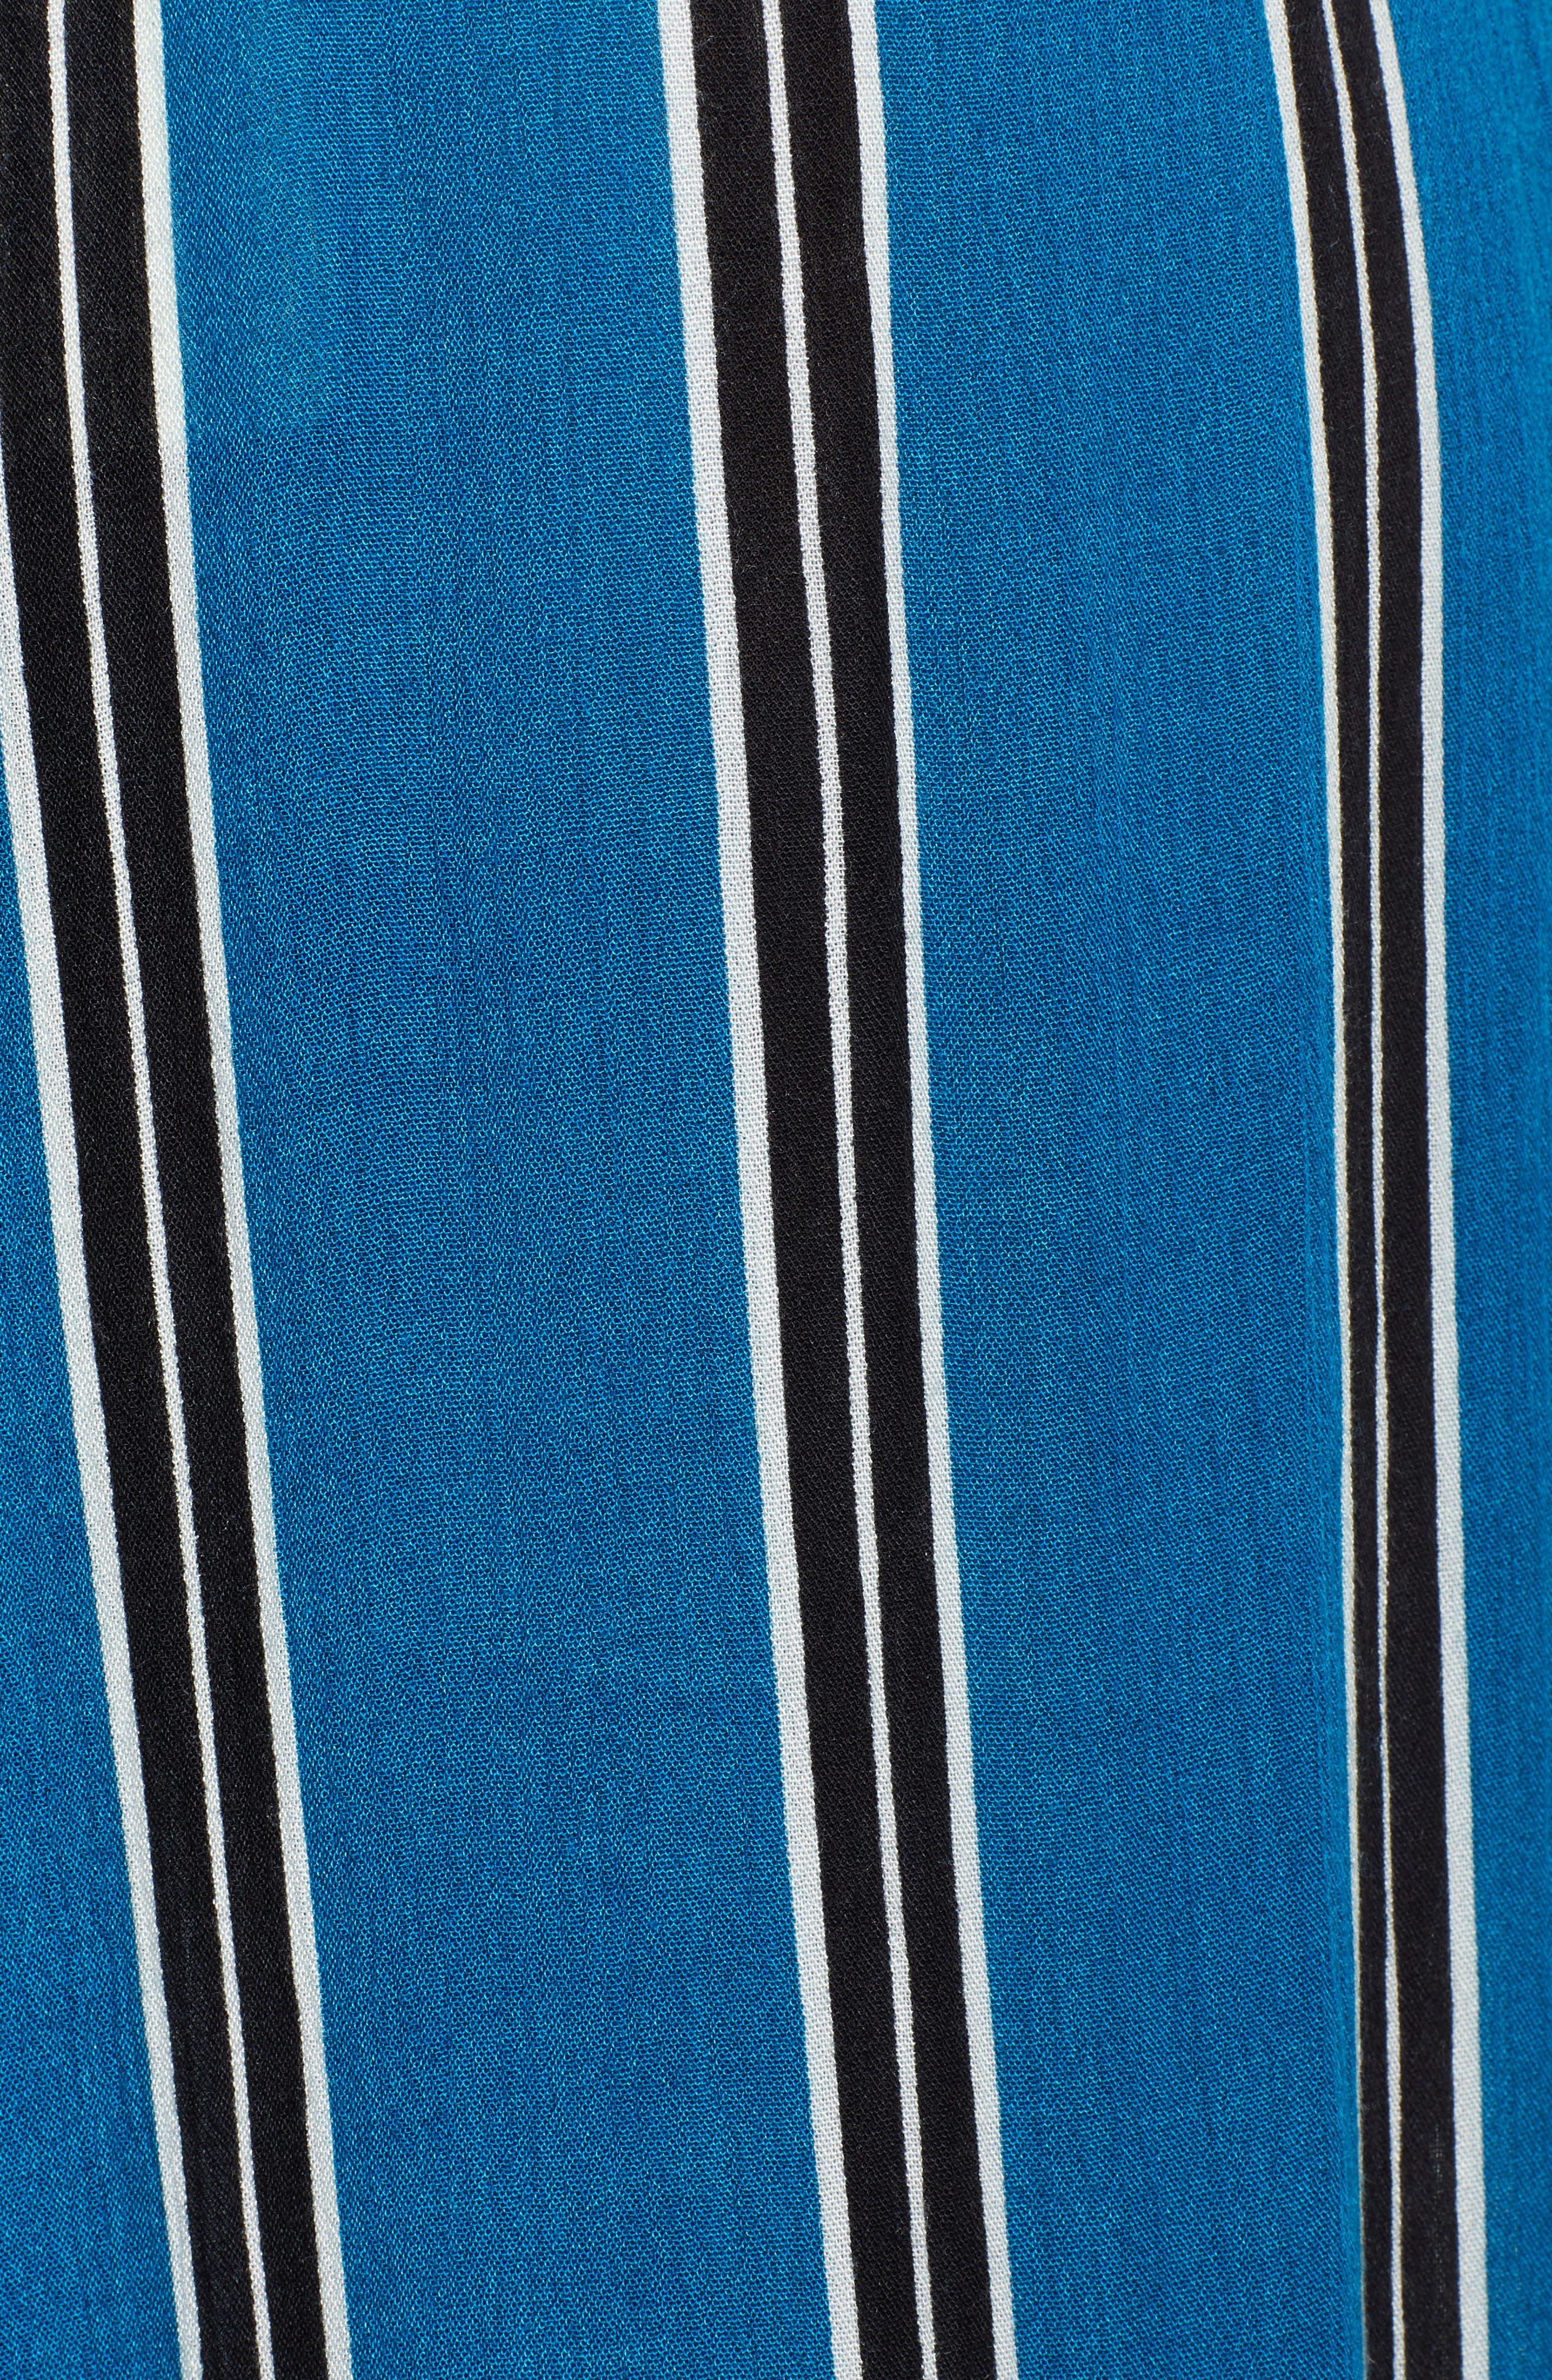 Stripe Surplice Crop Top,                             Alternate thumbnail 6, color,